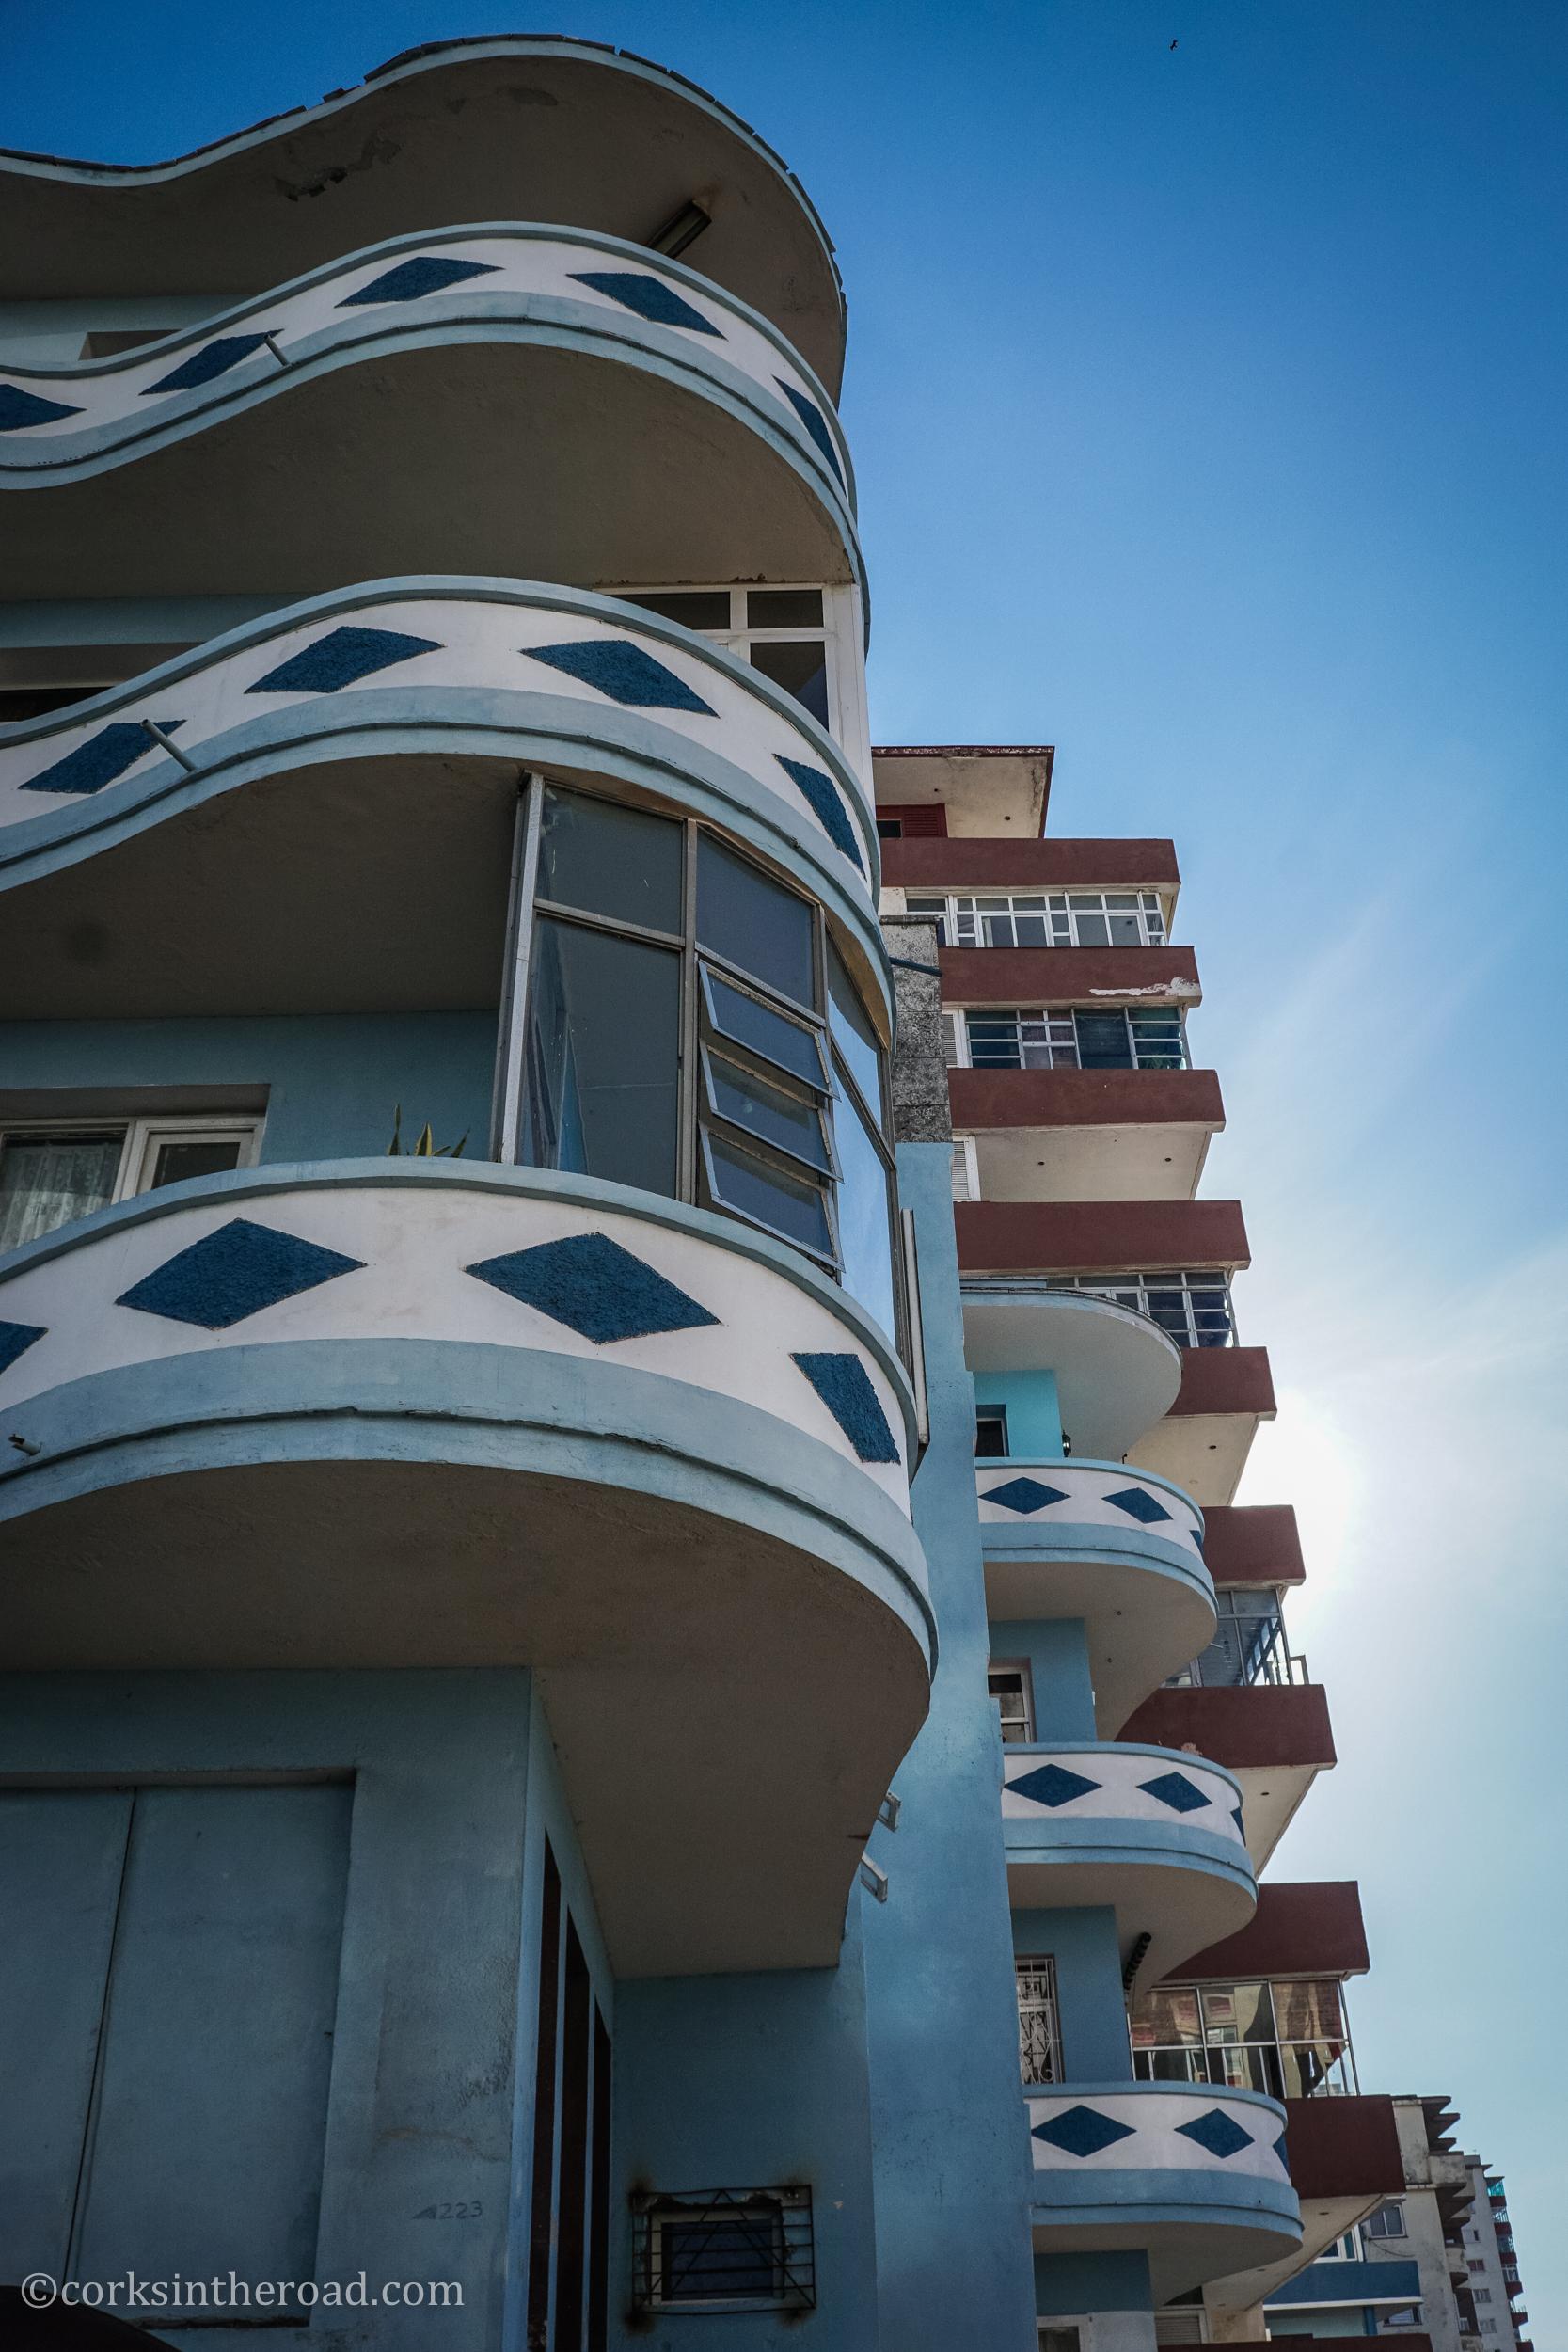 Architecture, Corksintheroad, Cuba, Havana-18.jpg